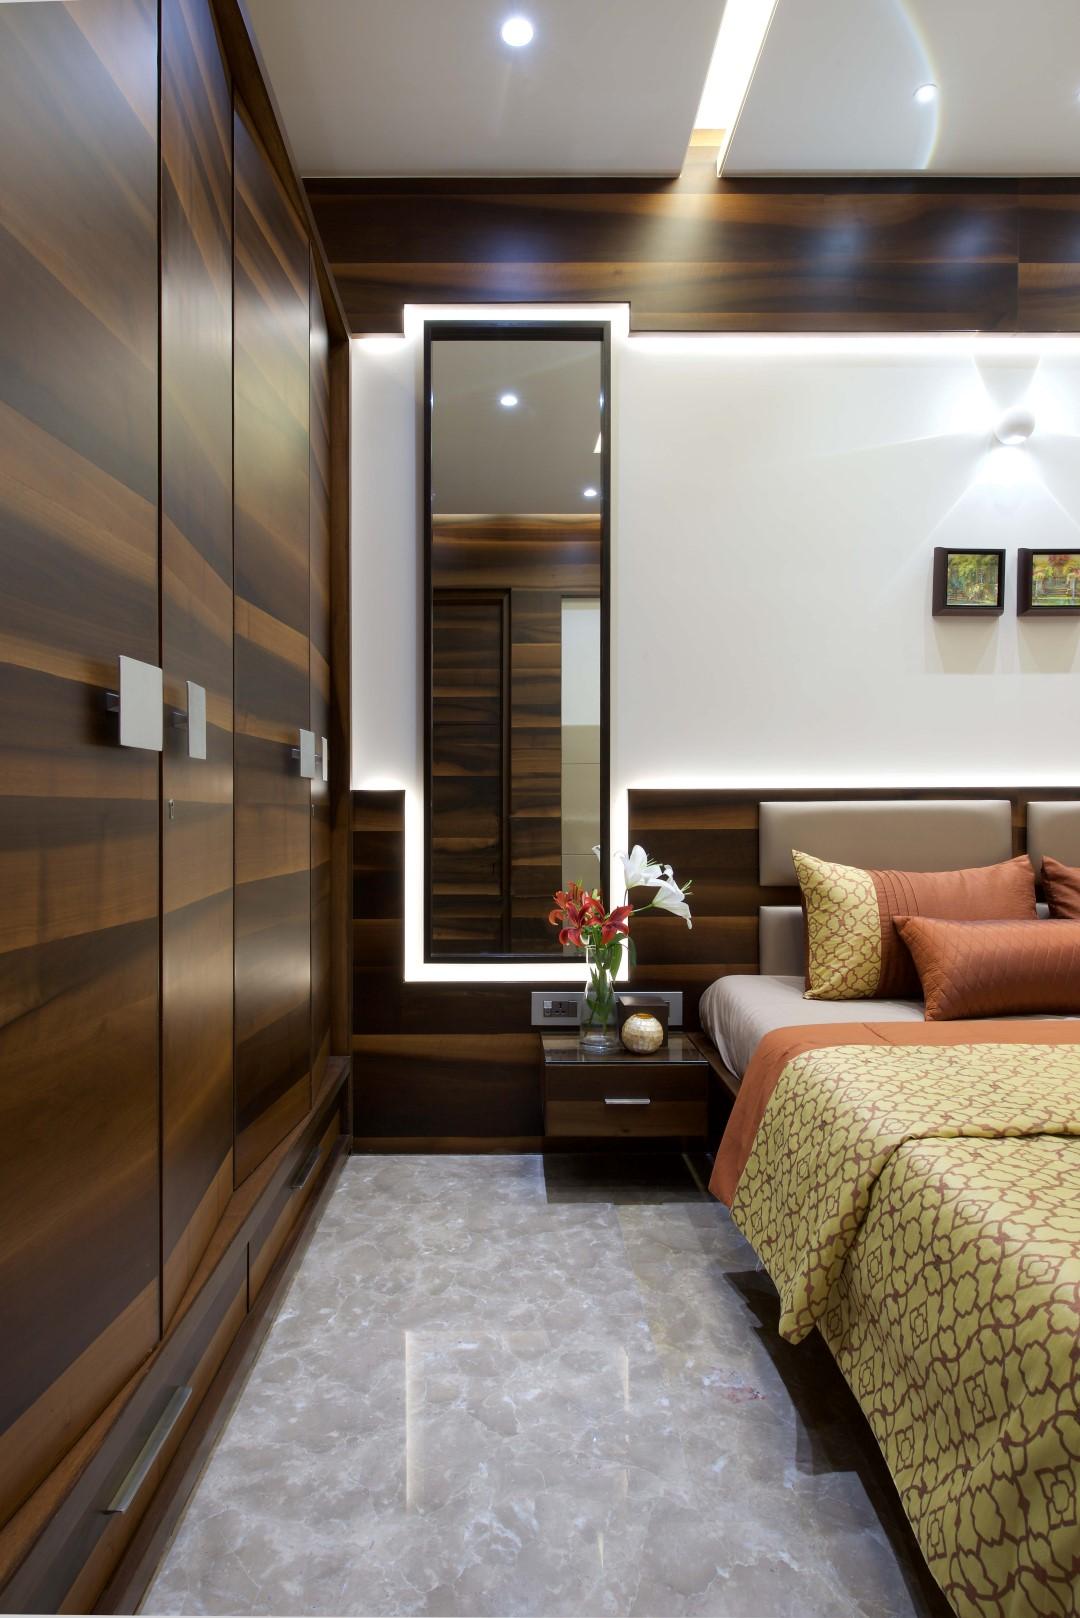 3 Bhk Apartment Interiors At Yari Road Amit Shastri